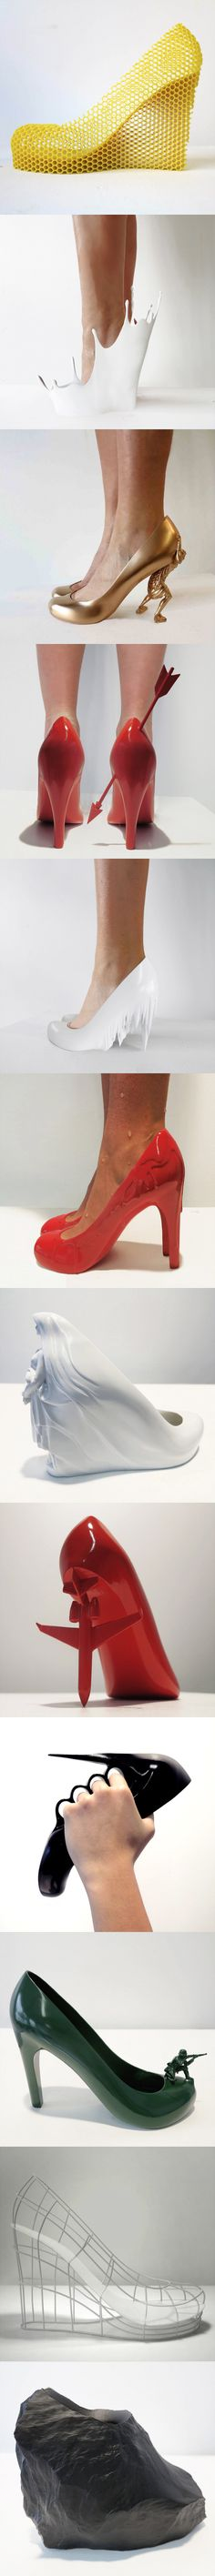 12 Shoes for 12 Lovers, by Sebastian Errazuriz